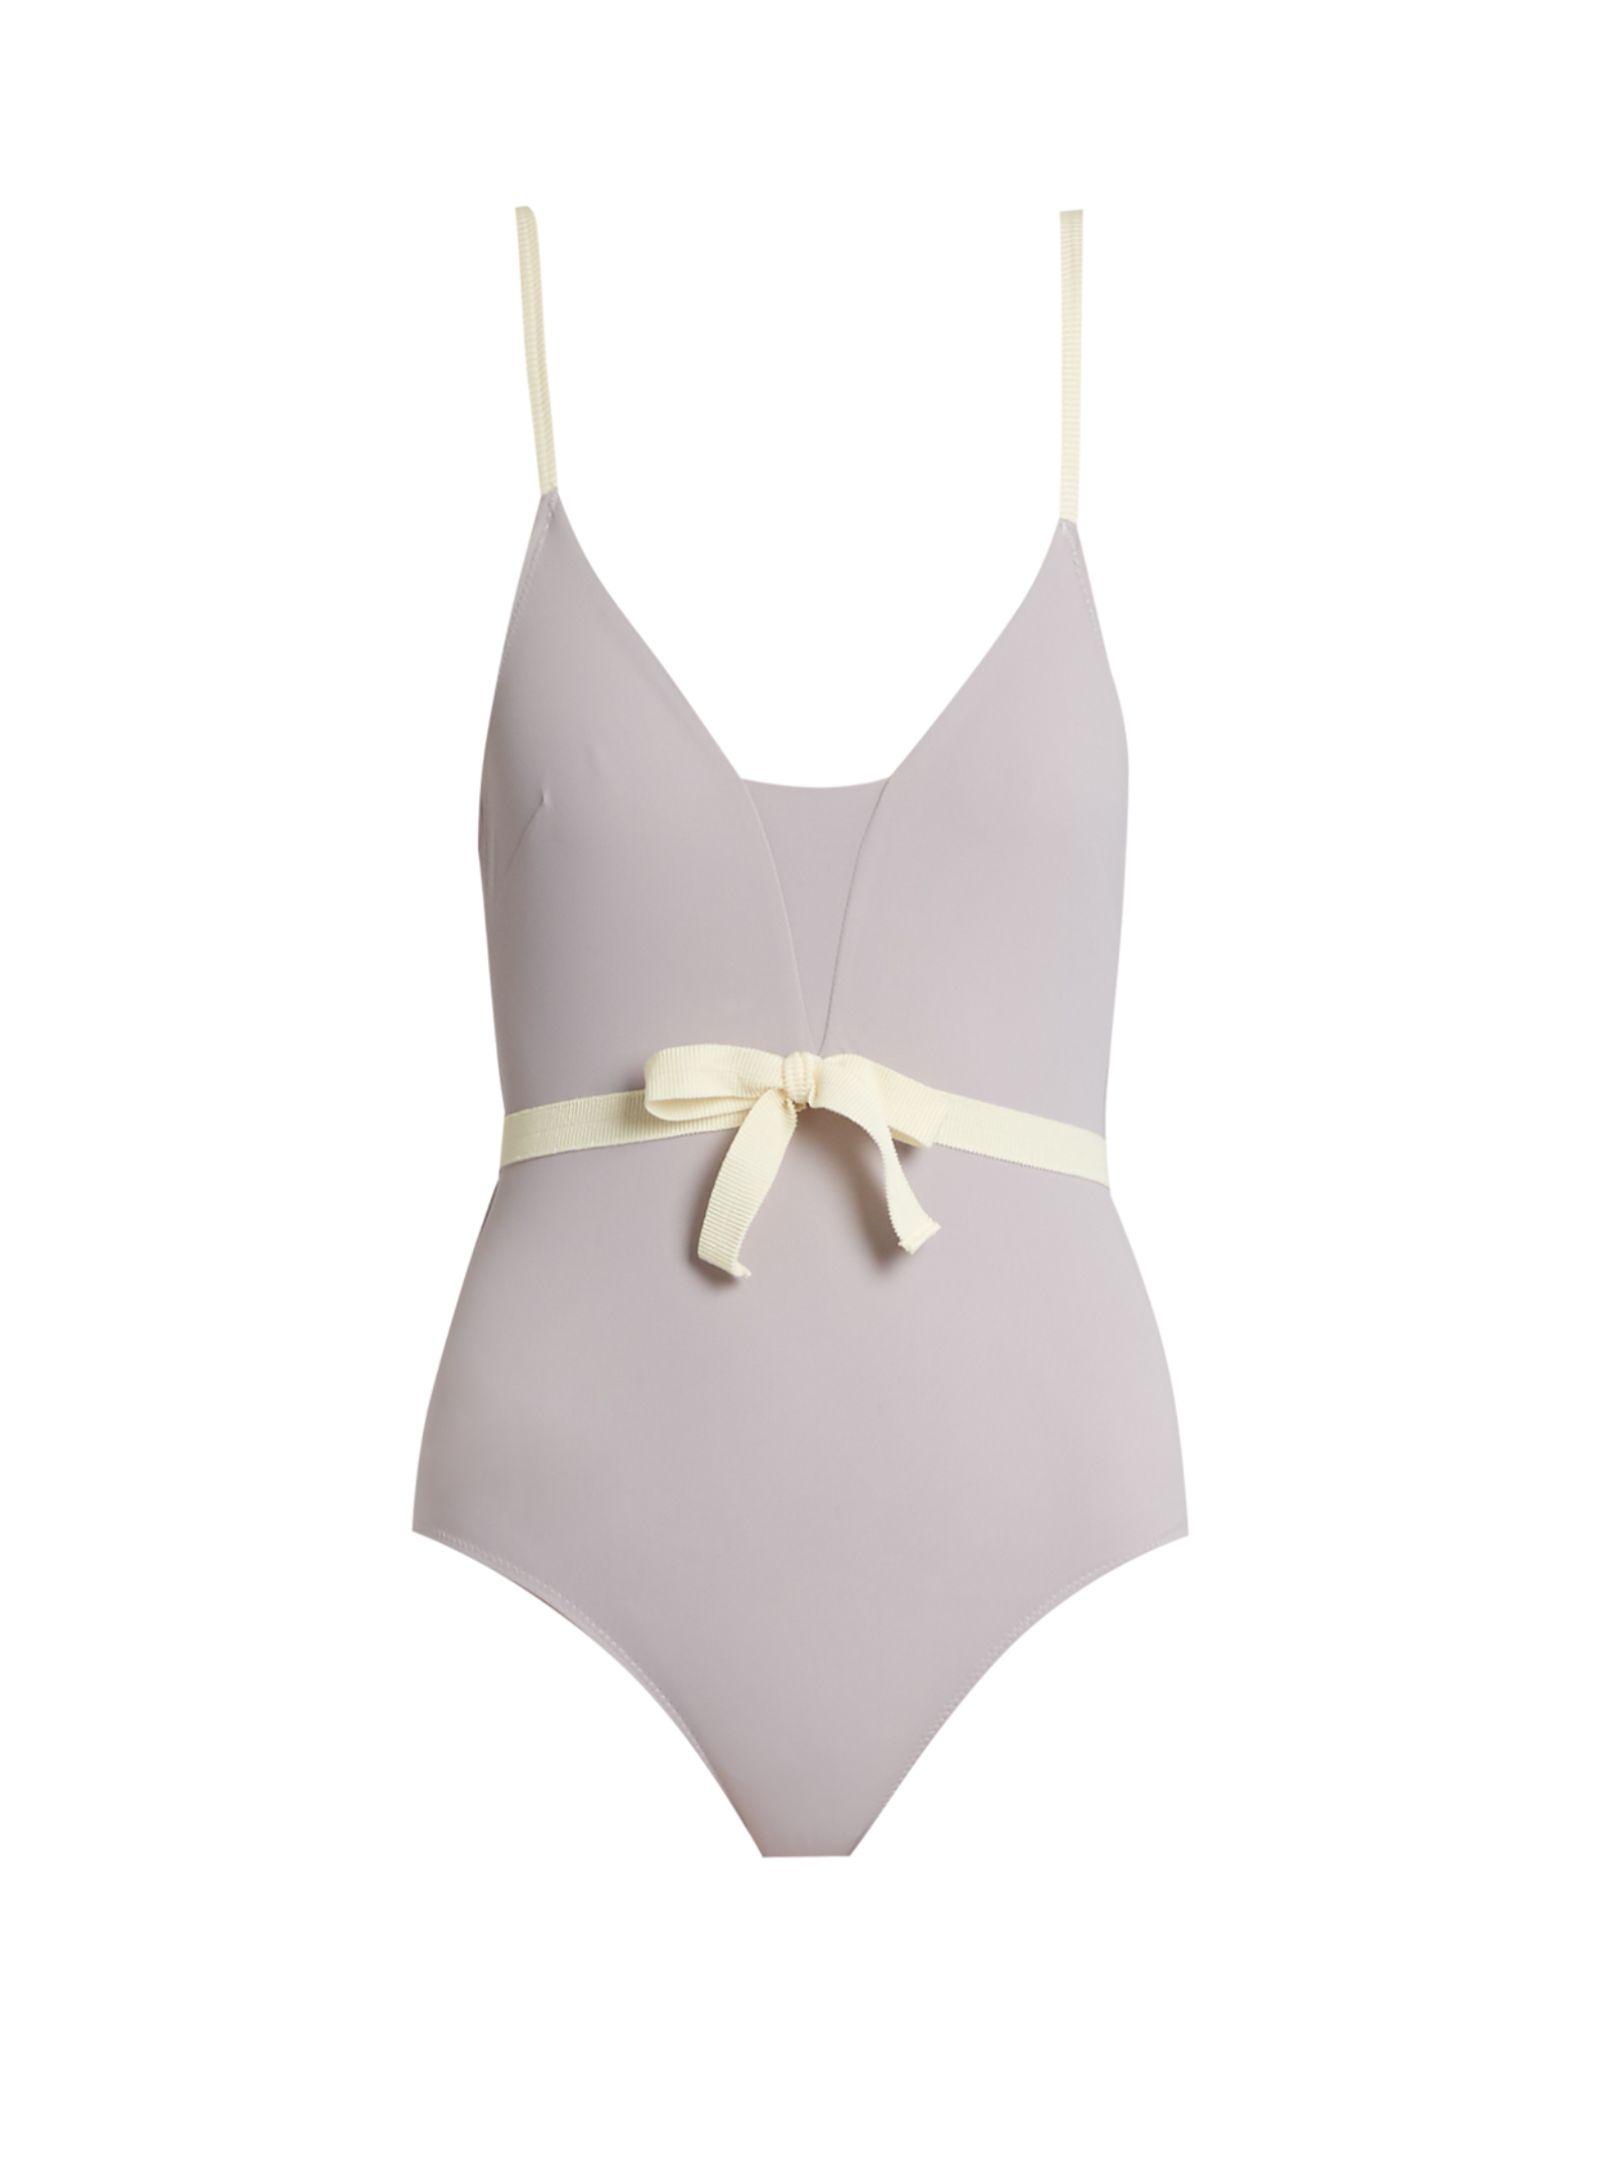 Waist Bow Swimsuit Roxana Salehoun Matchesfashioncom Lingeri3